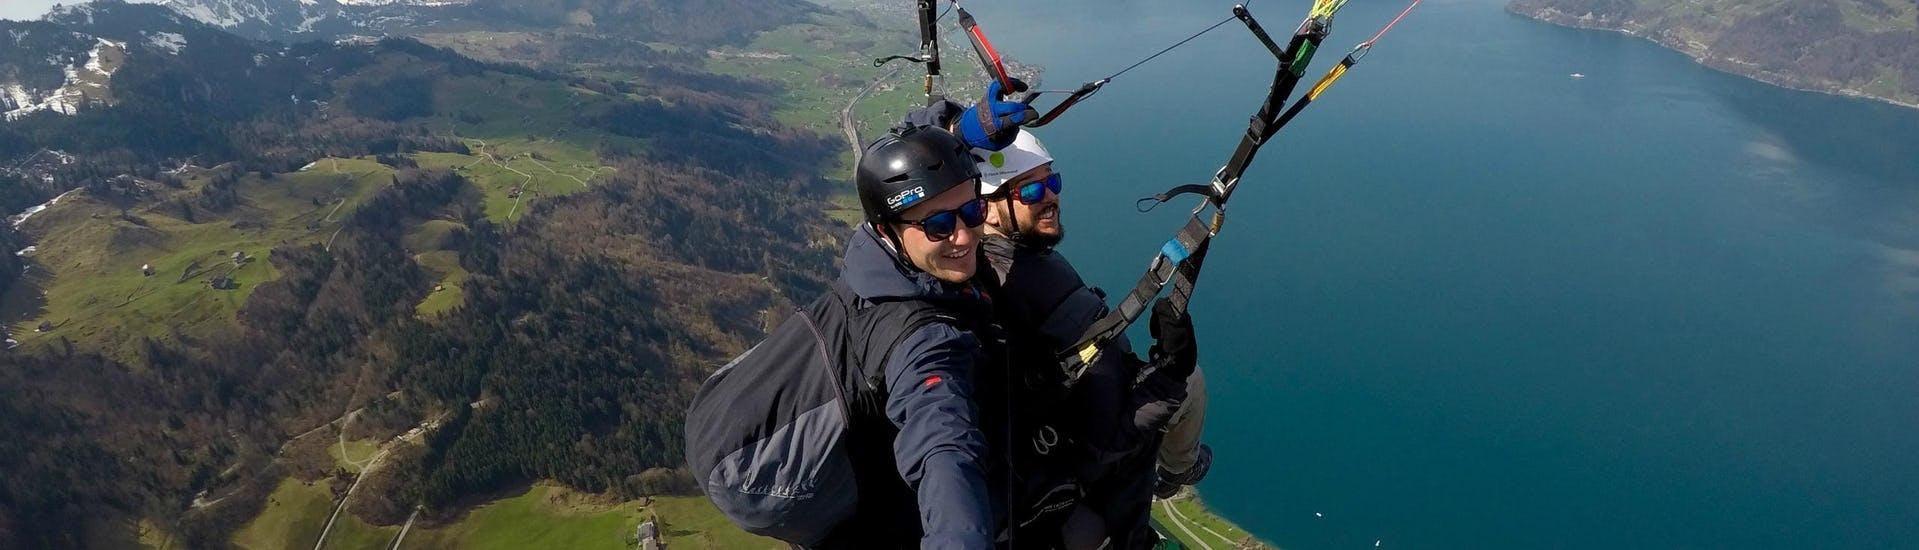 tandem-paragliding-in-niederbauen-groups-from-6-people-skyglide-hero